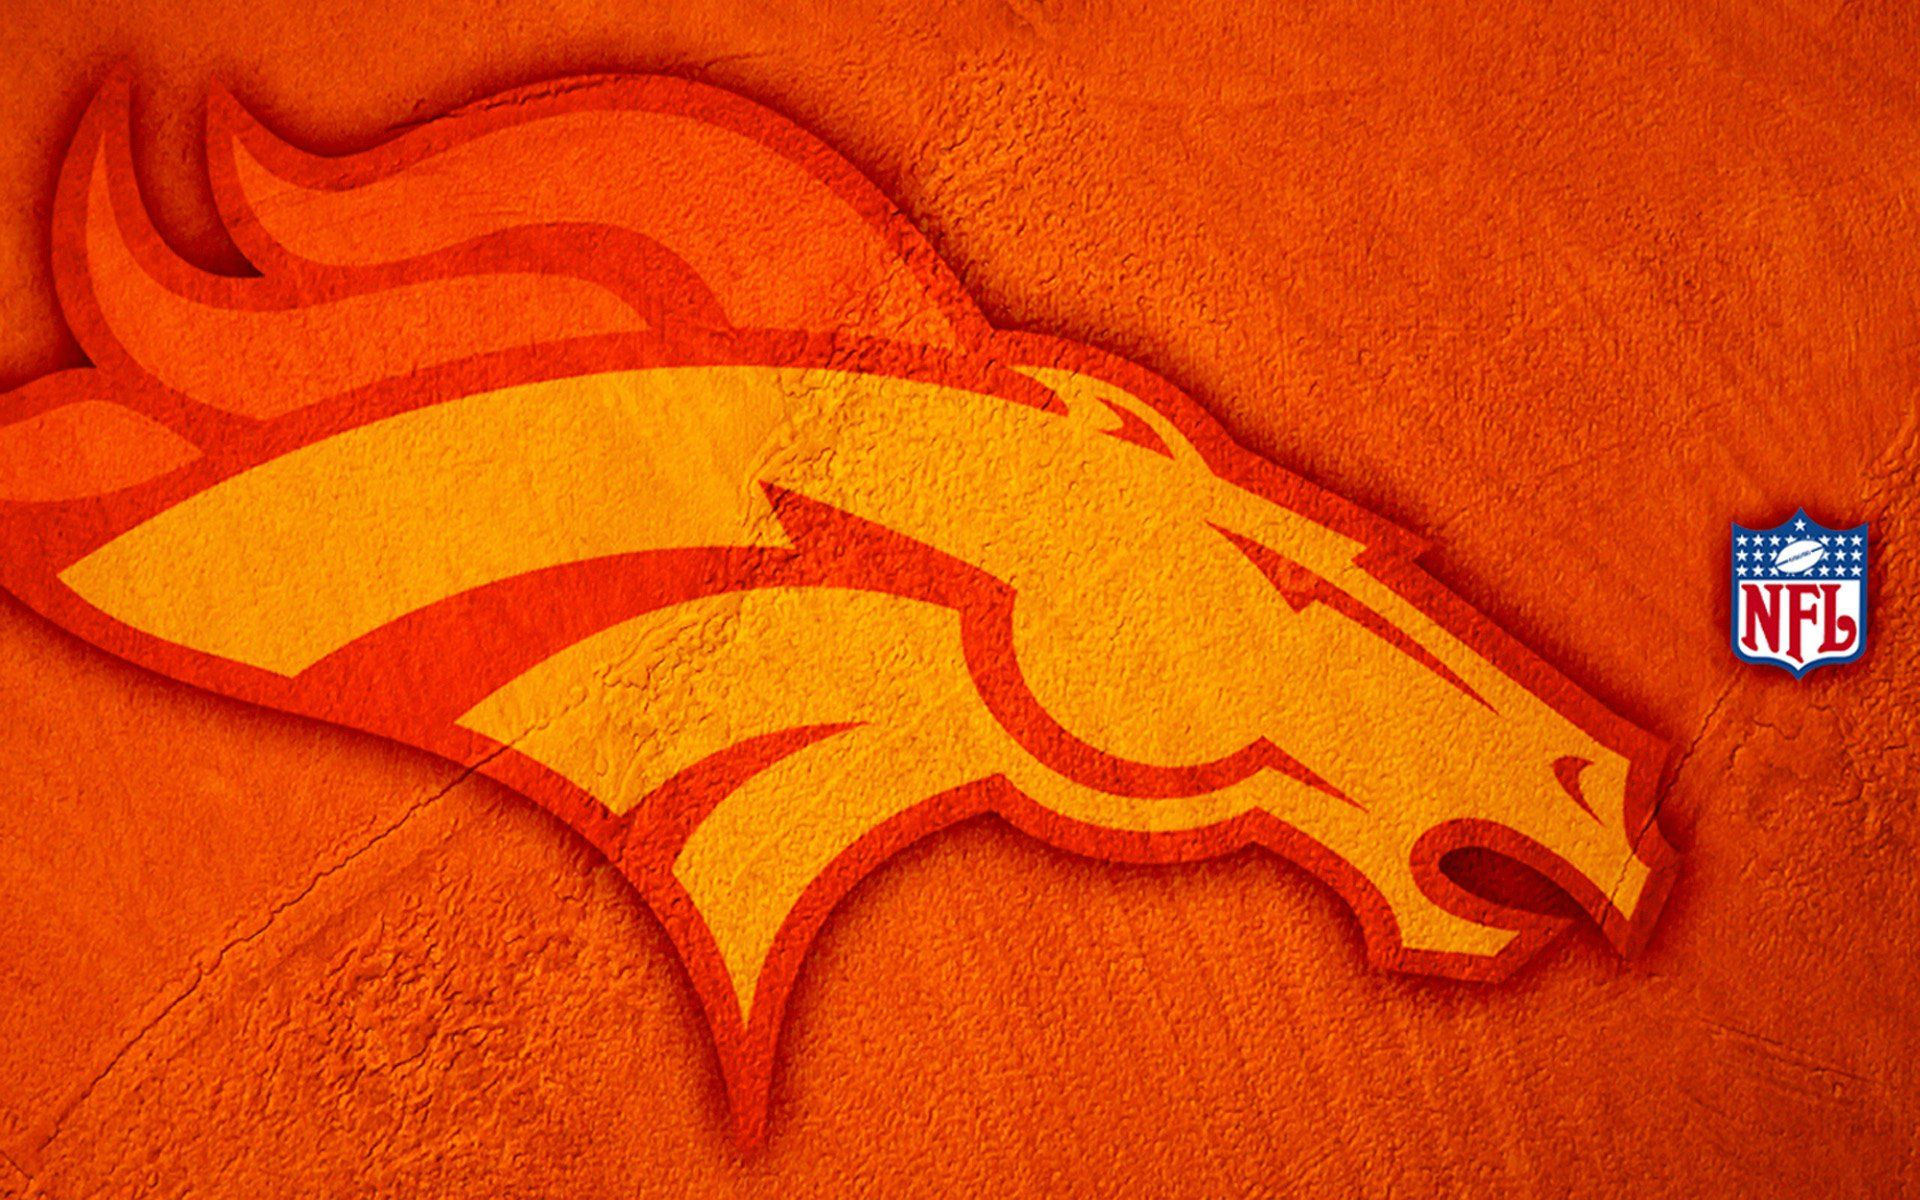 D Denver Broncos Wallpaper (с изображениями)